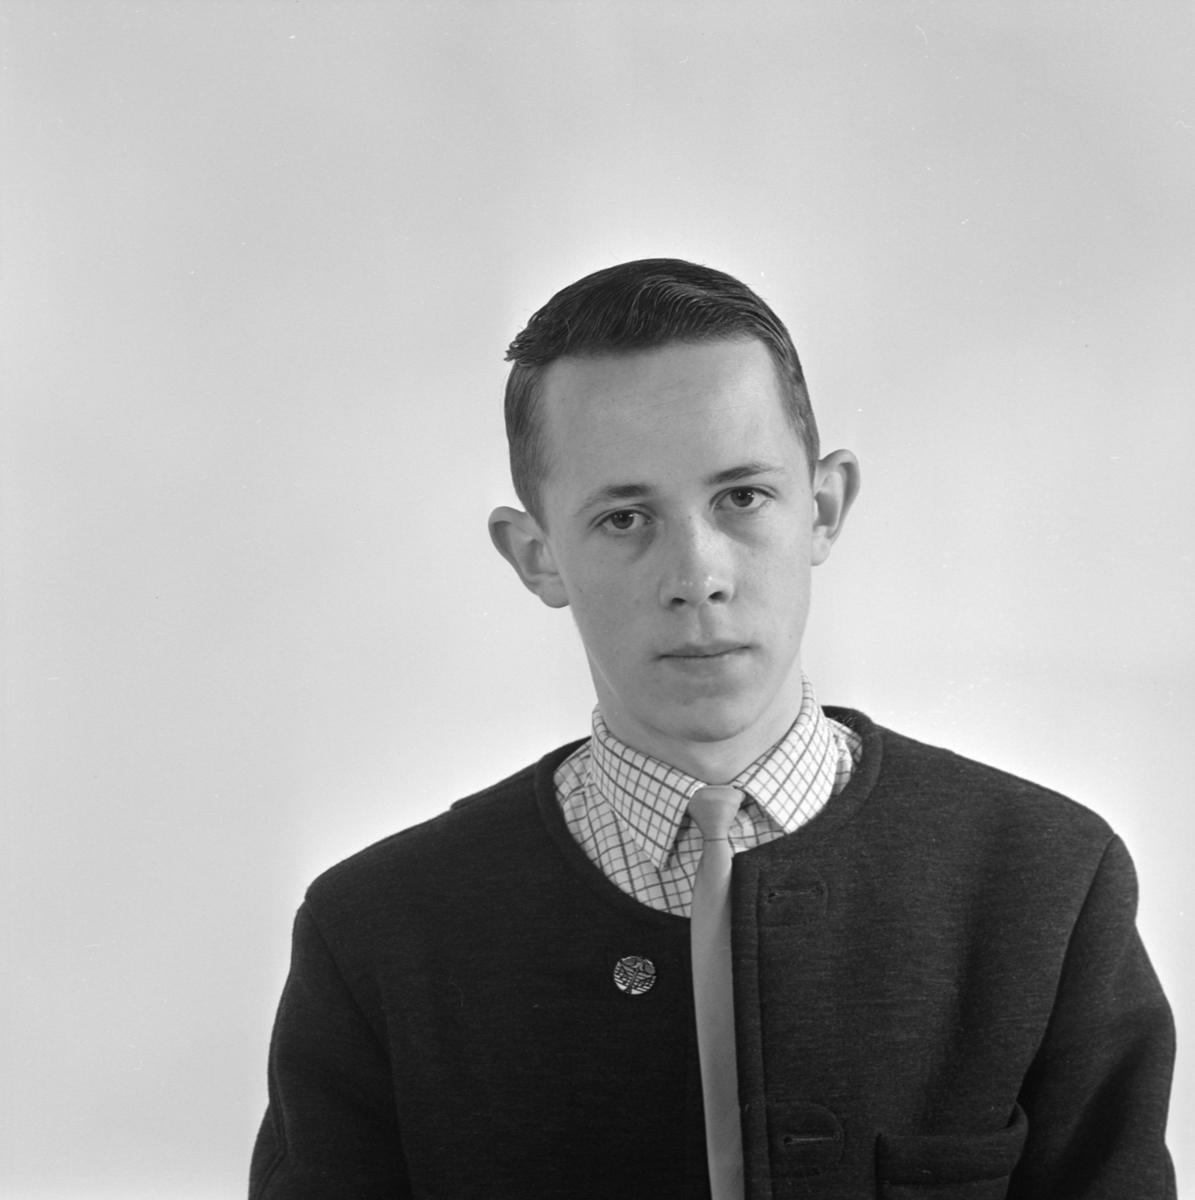 Hans Andersson, Uppsala april 1965